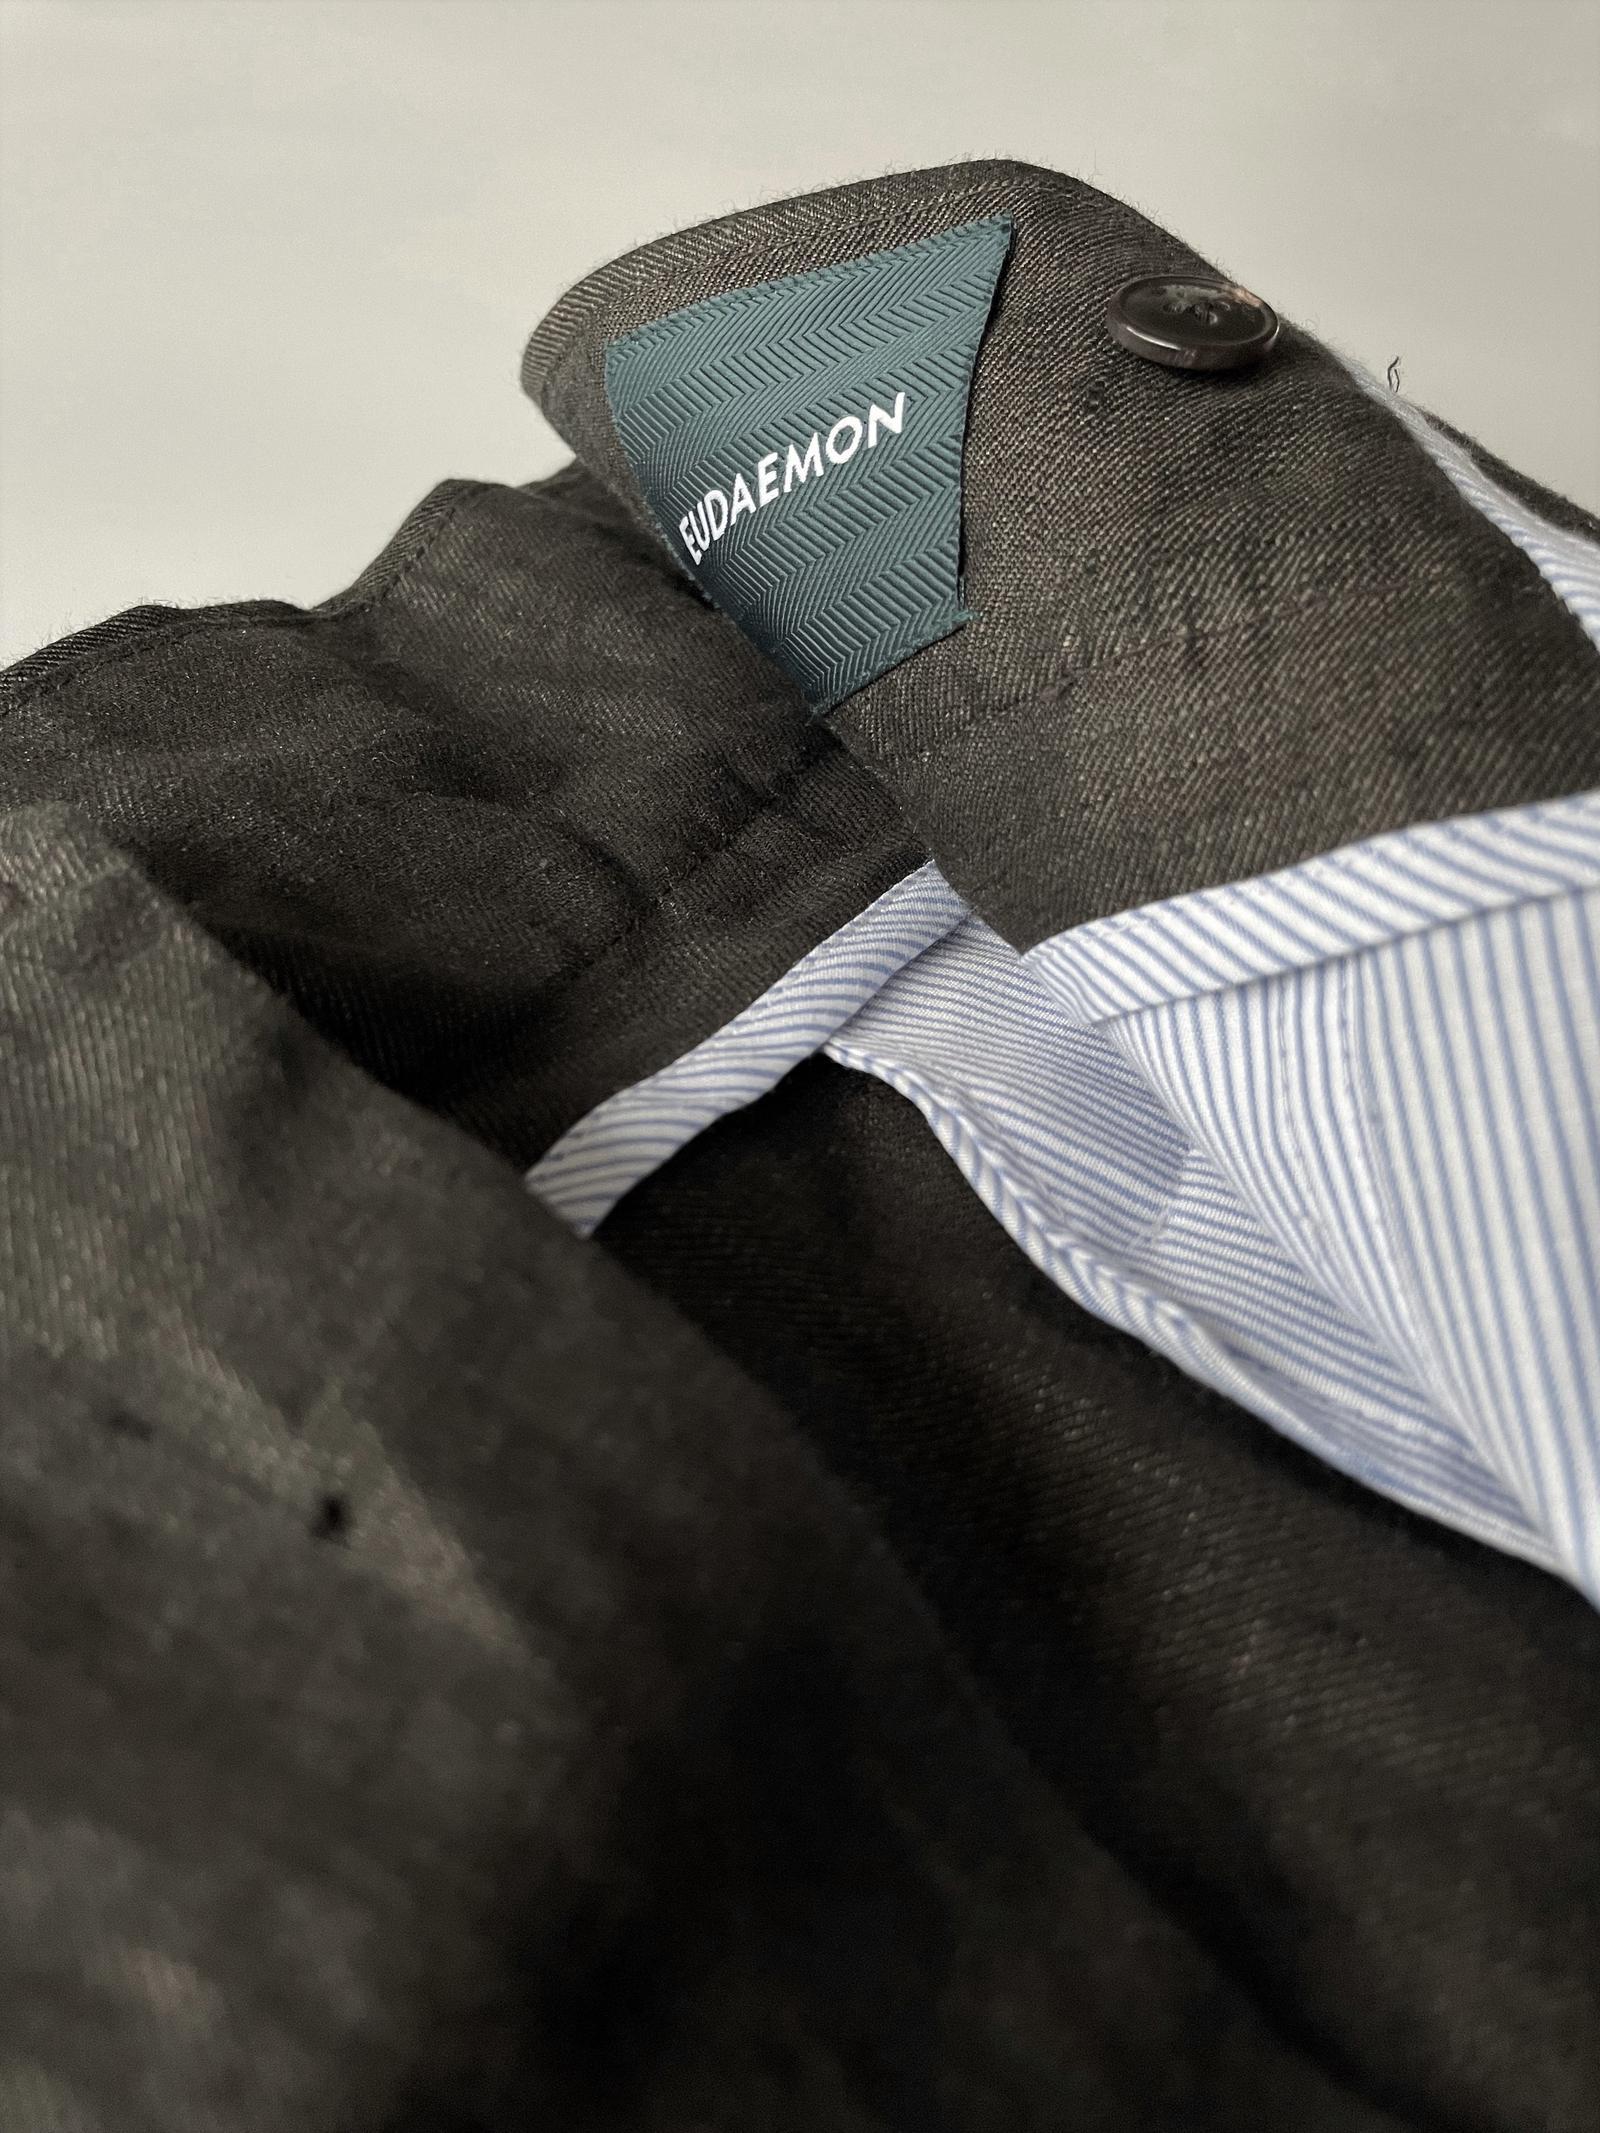 Gurkha Shorts - Iced Americano Linen